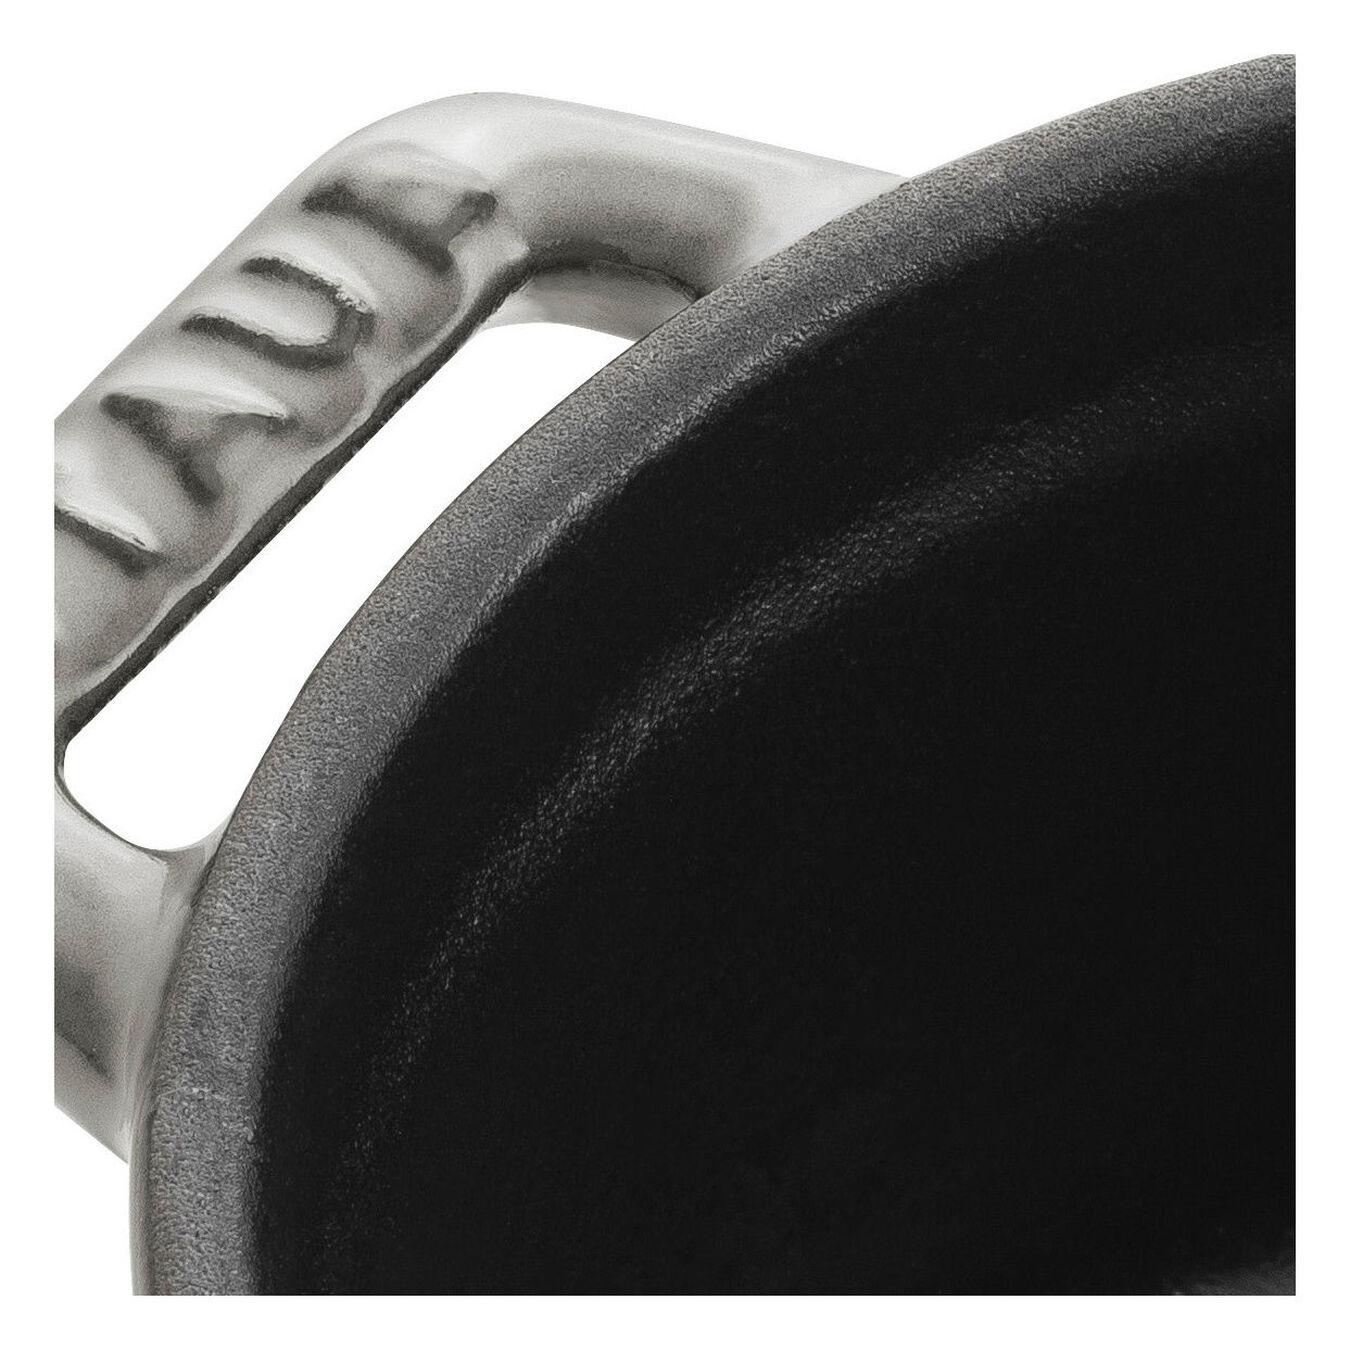 Mini Cocotte 10 cm, rund, Graphit-Grau, Gusseisen,,large 3